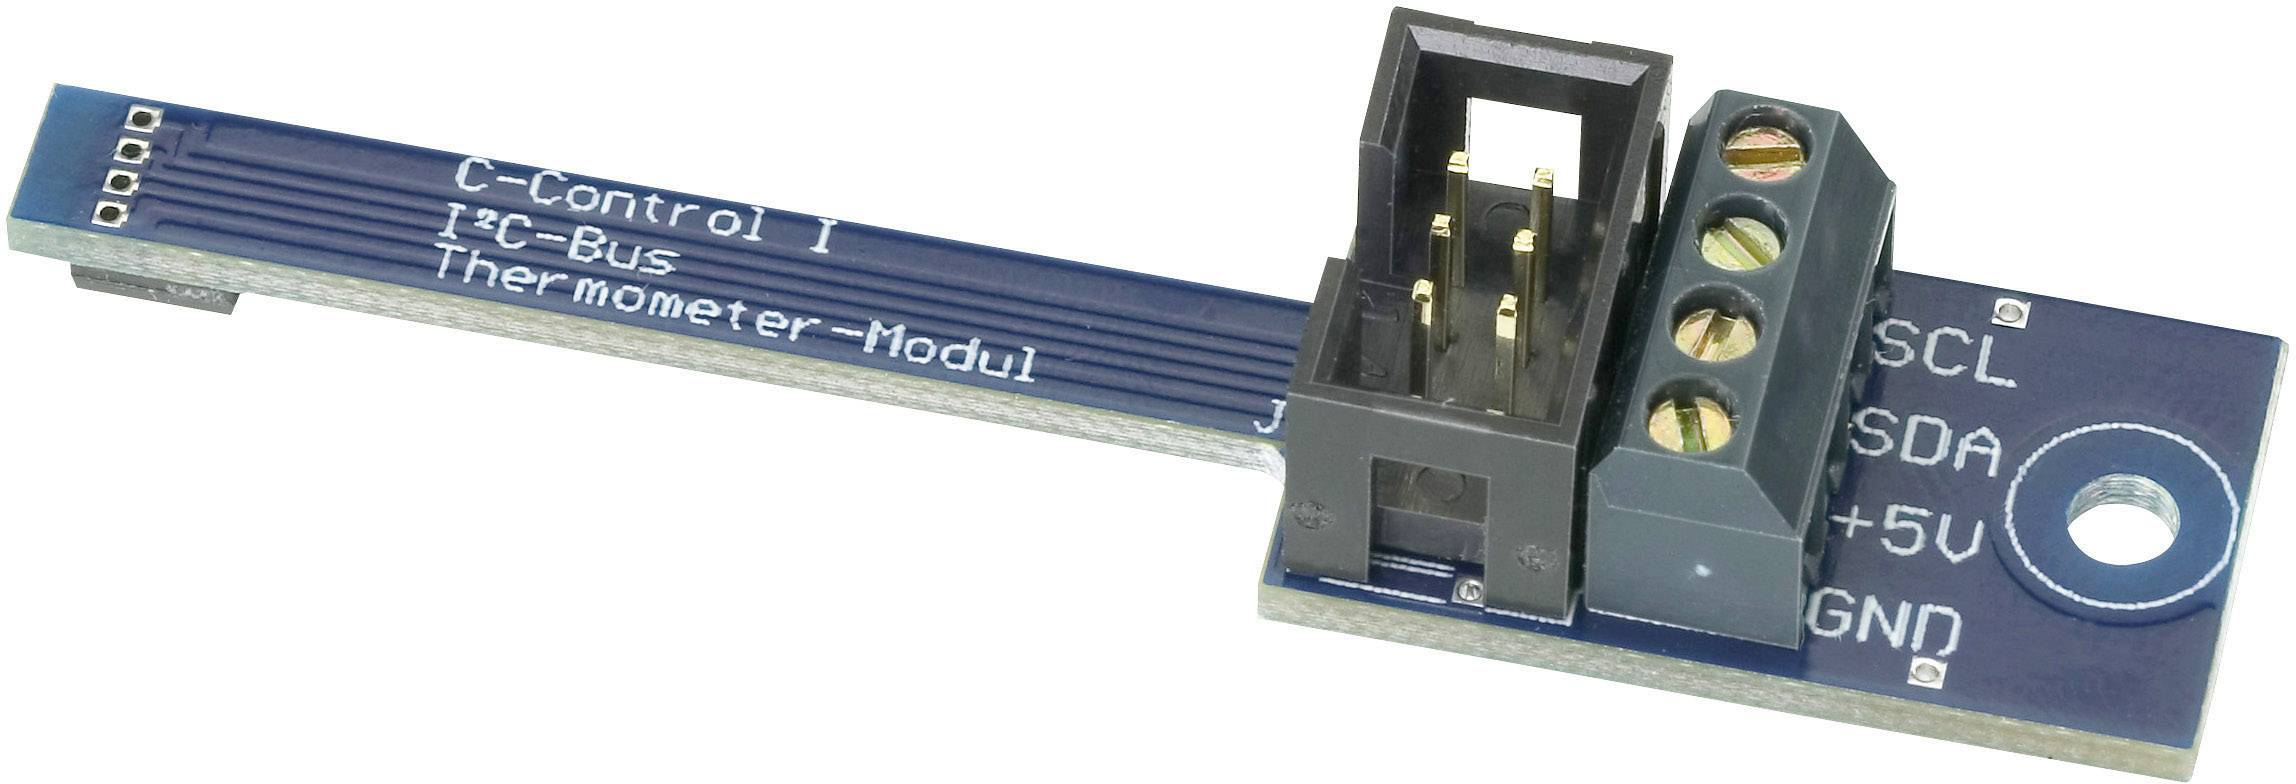 I²C teplomer modul C-Control, -55 až 125 °C